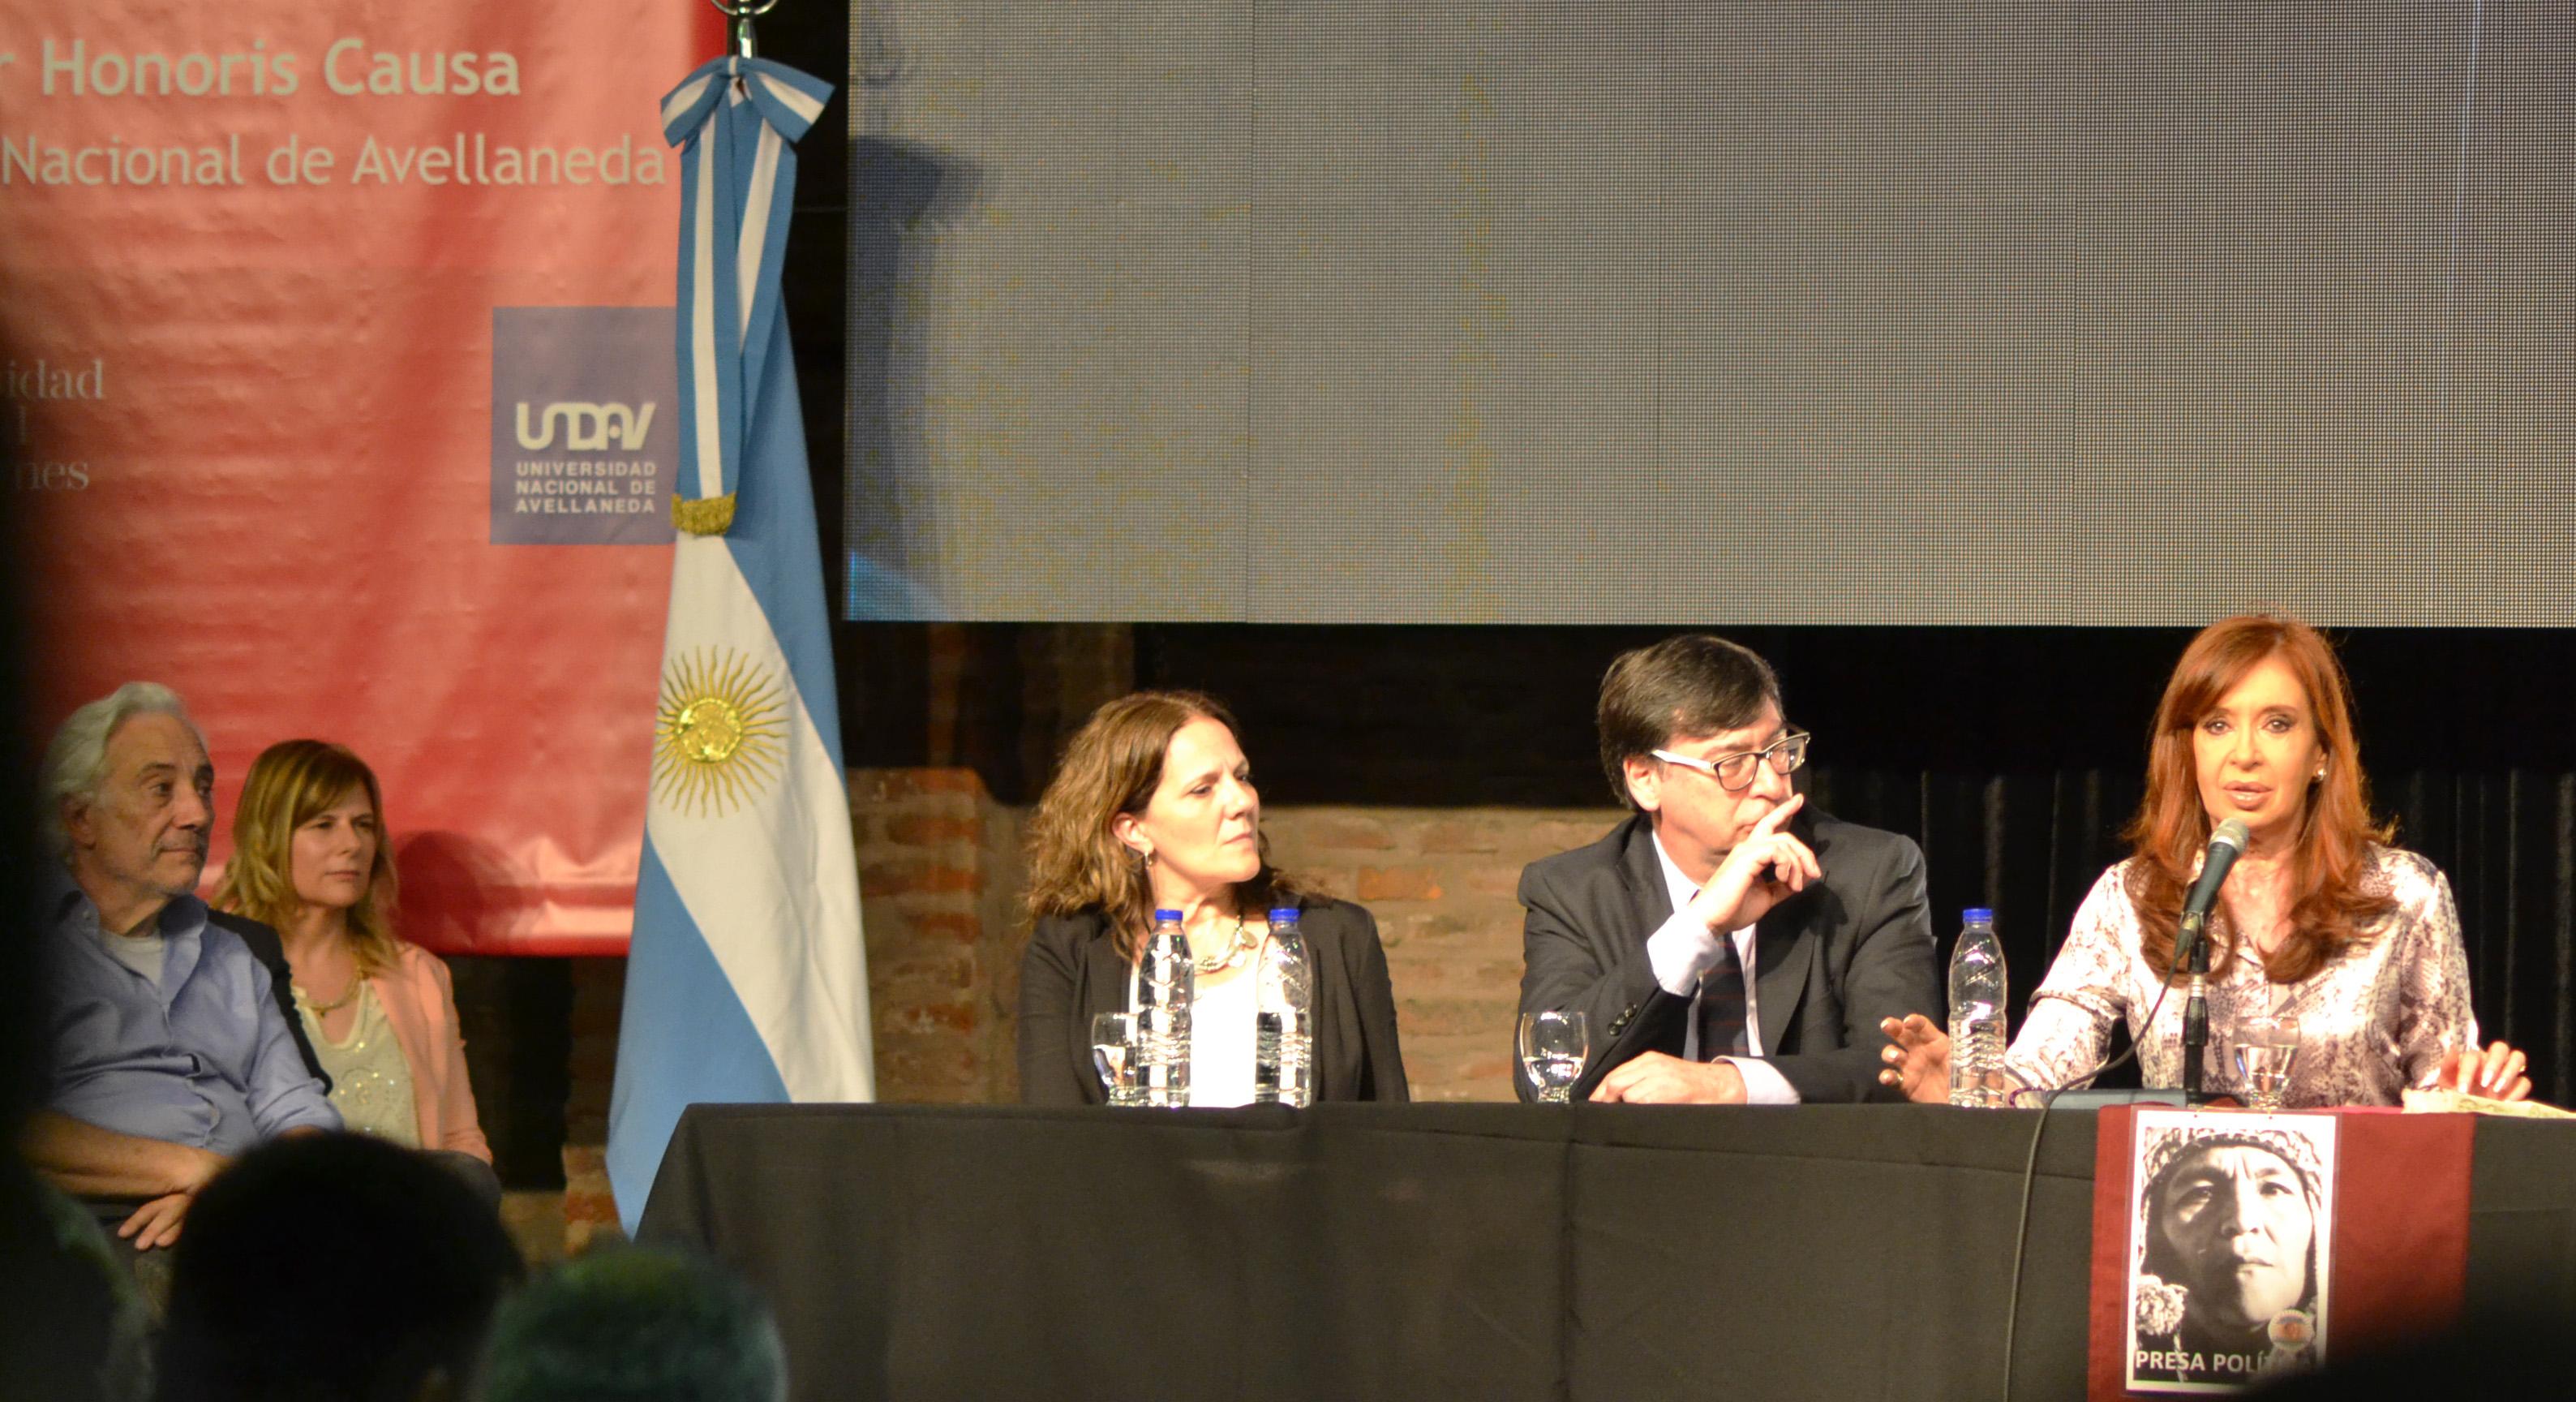 Saintout participó de la entrega del Doctorado Honoris Causa a Cristina Fernández de Kirchner